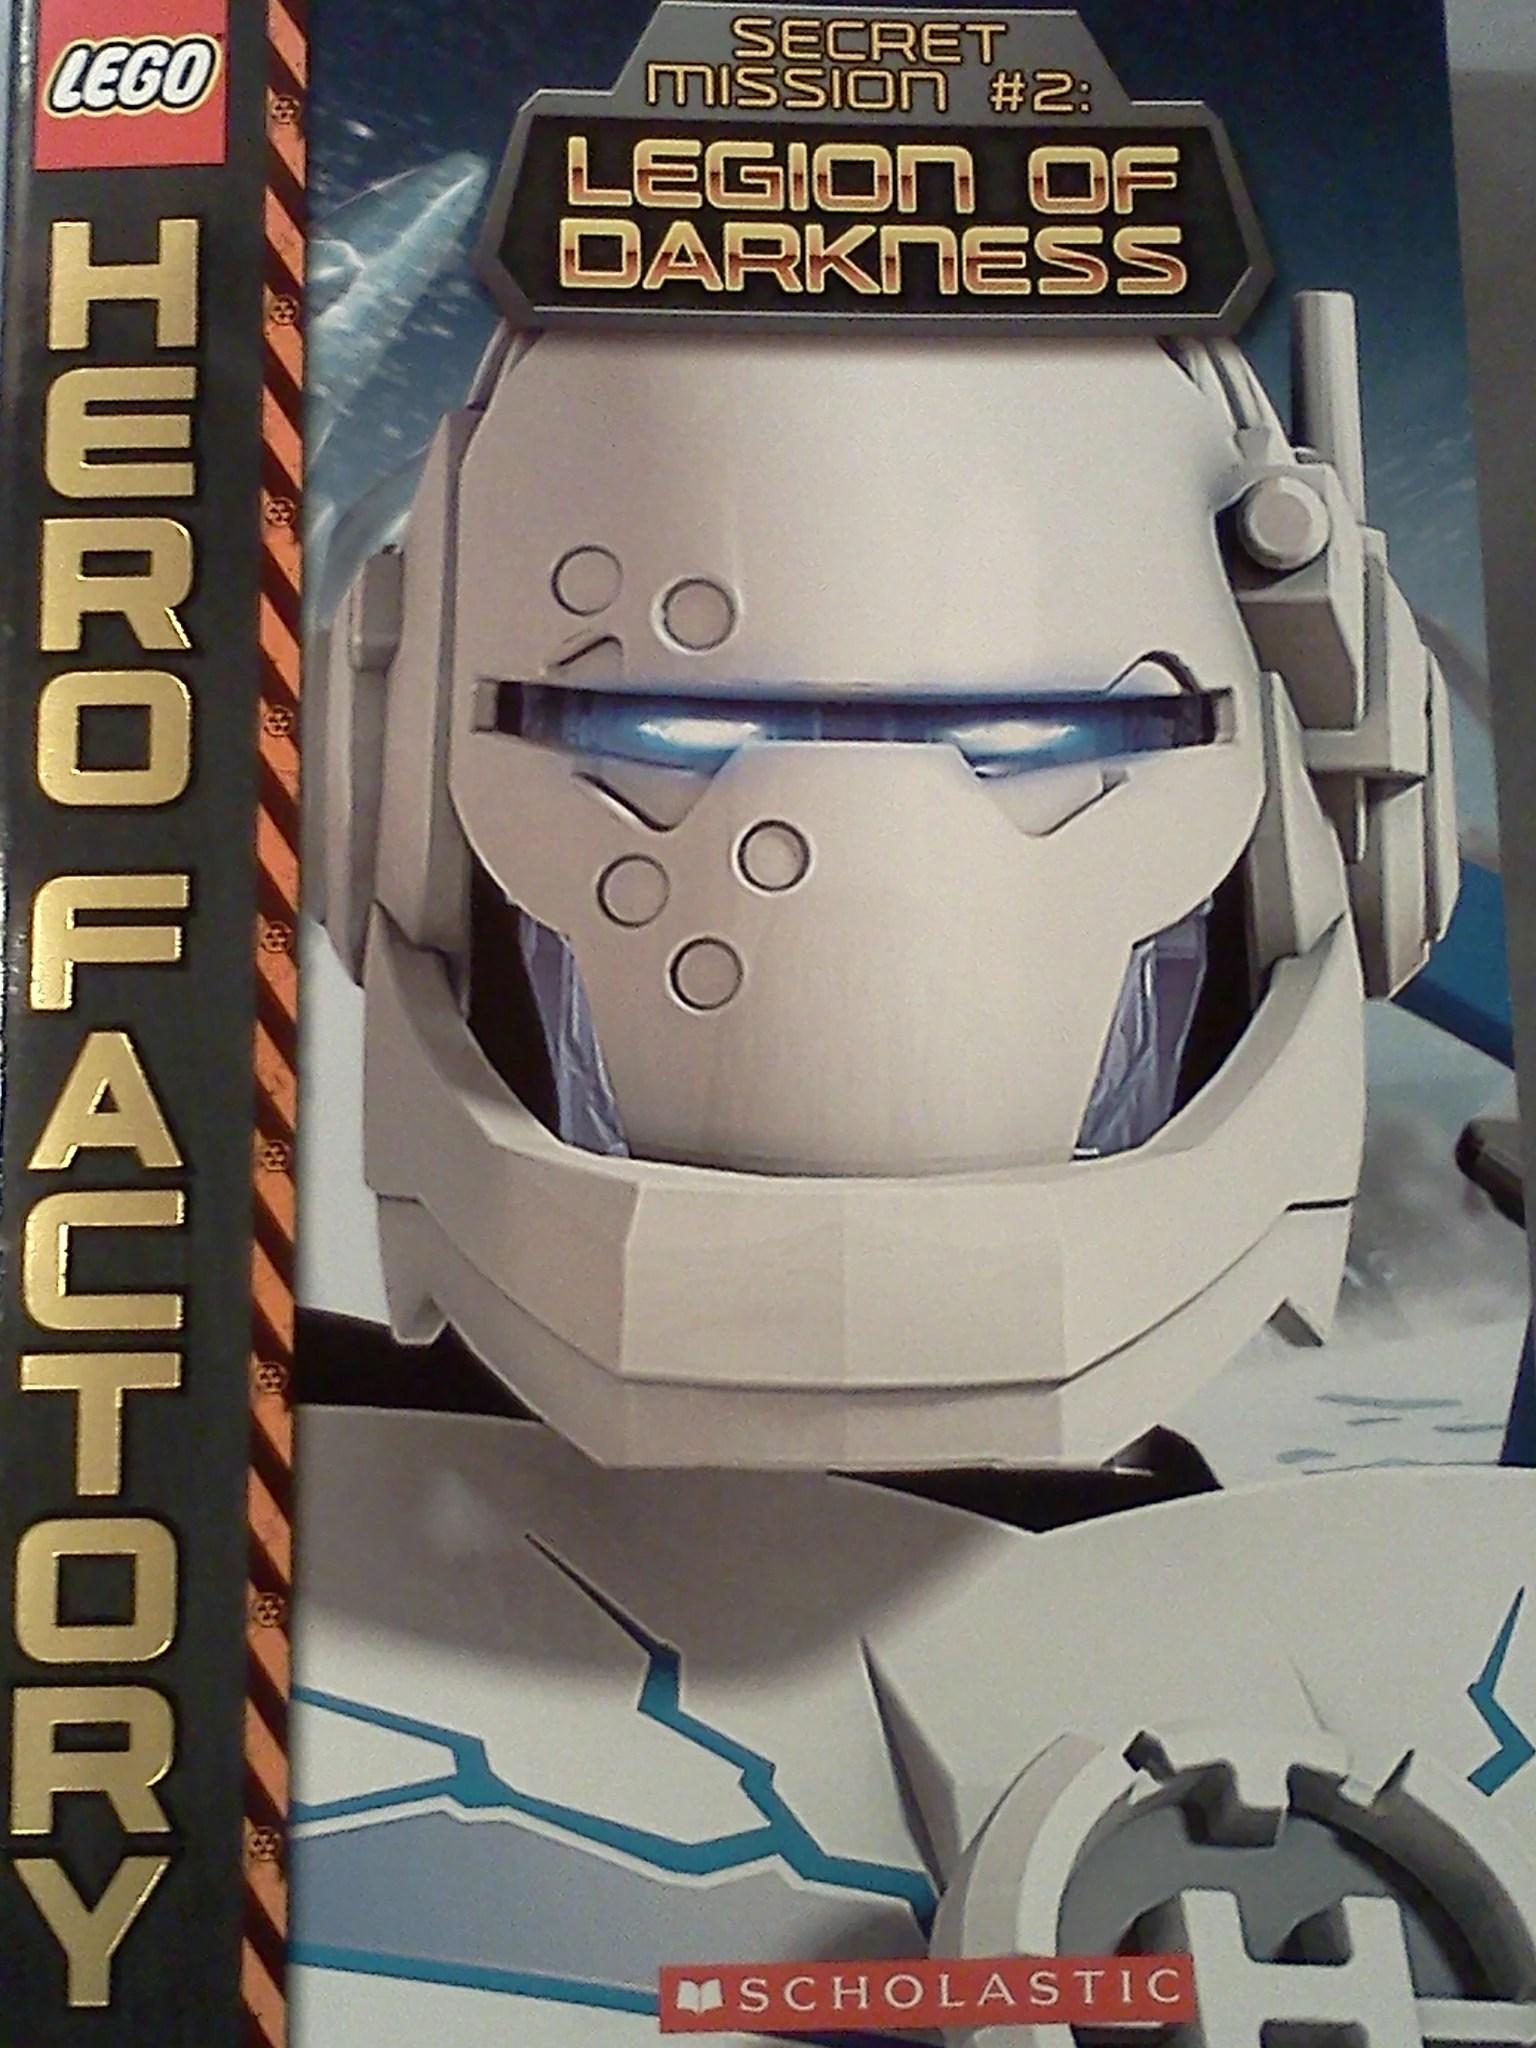 Hero Factory Secret Mission 2: Legion of Darkness ...